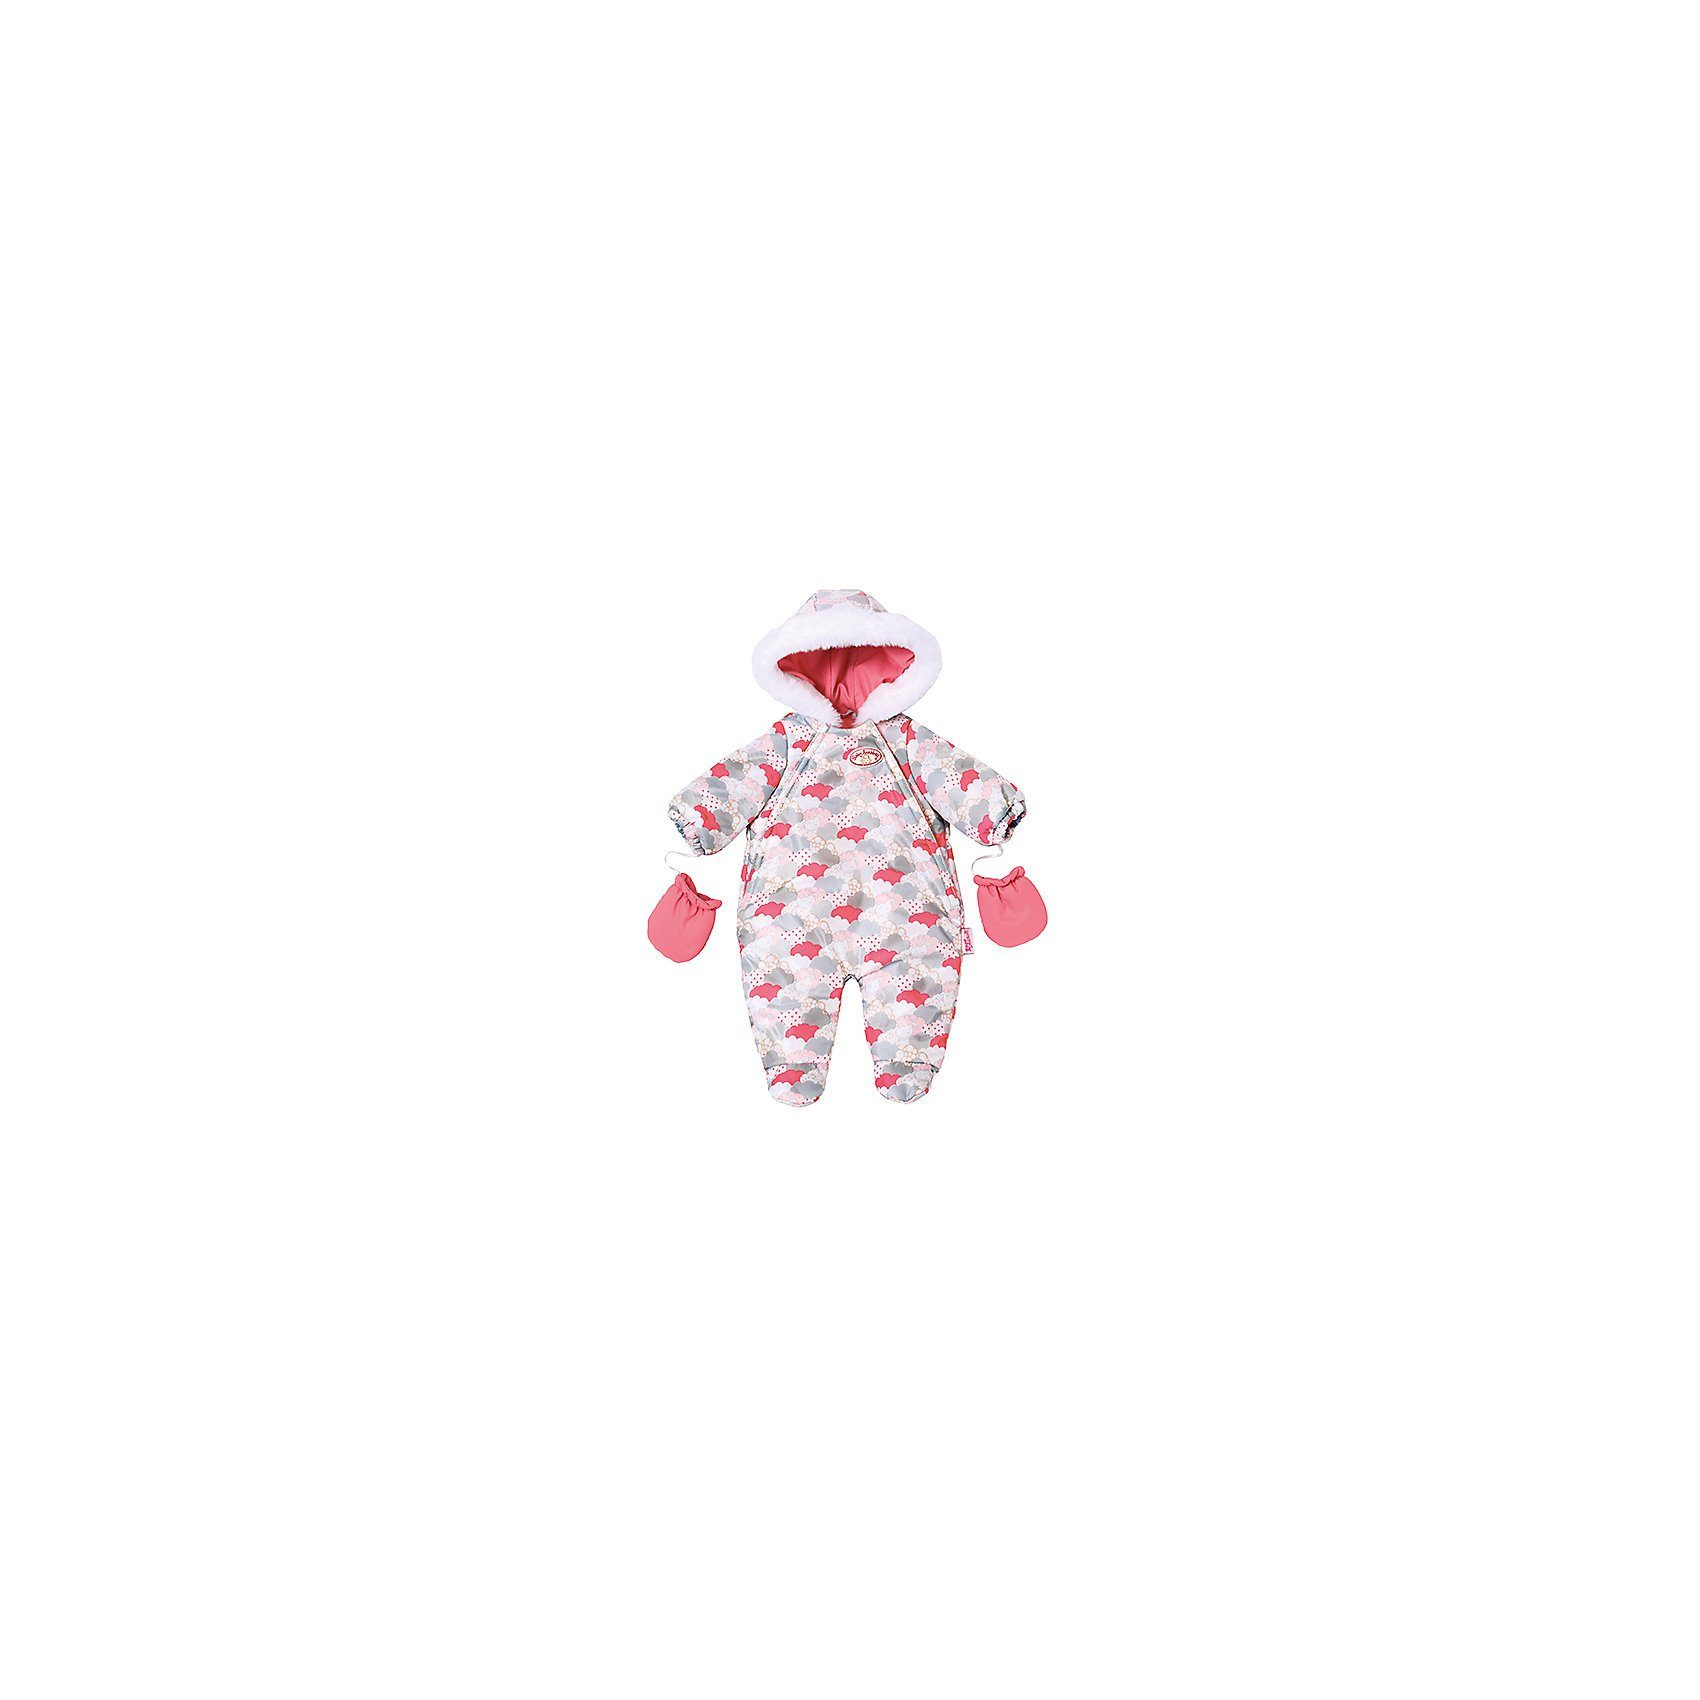 Zapf Creation Baby Annabell® Deluxe Winterspass Puppenkleidung, 46 cm